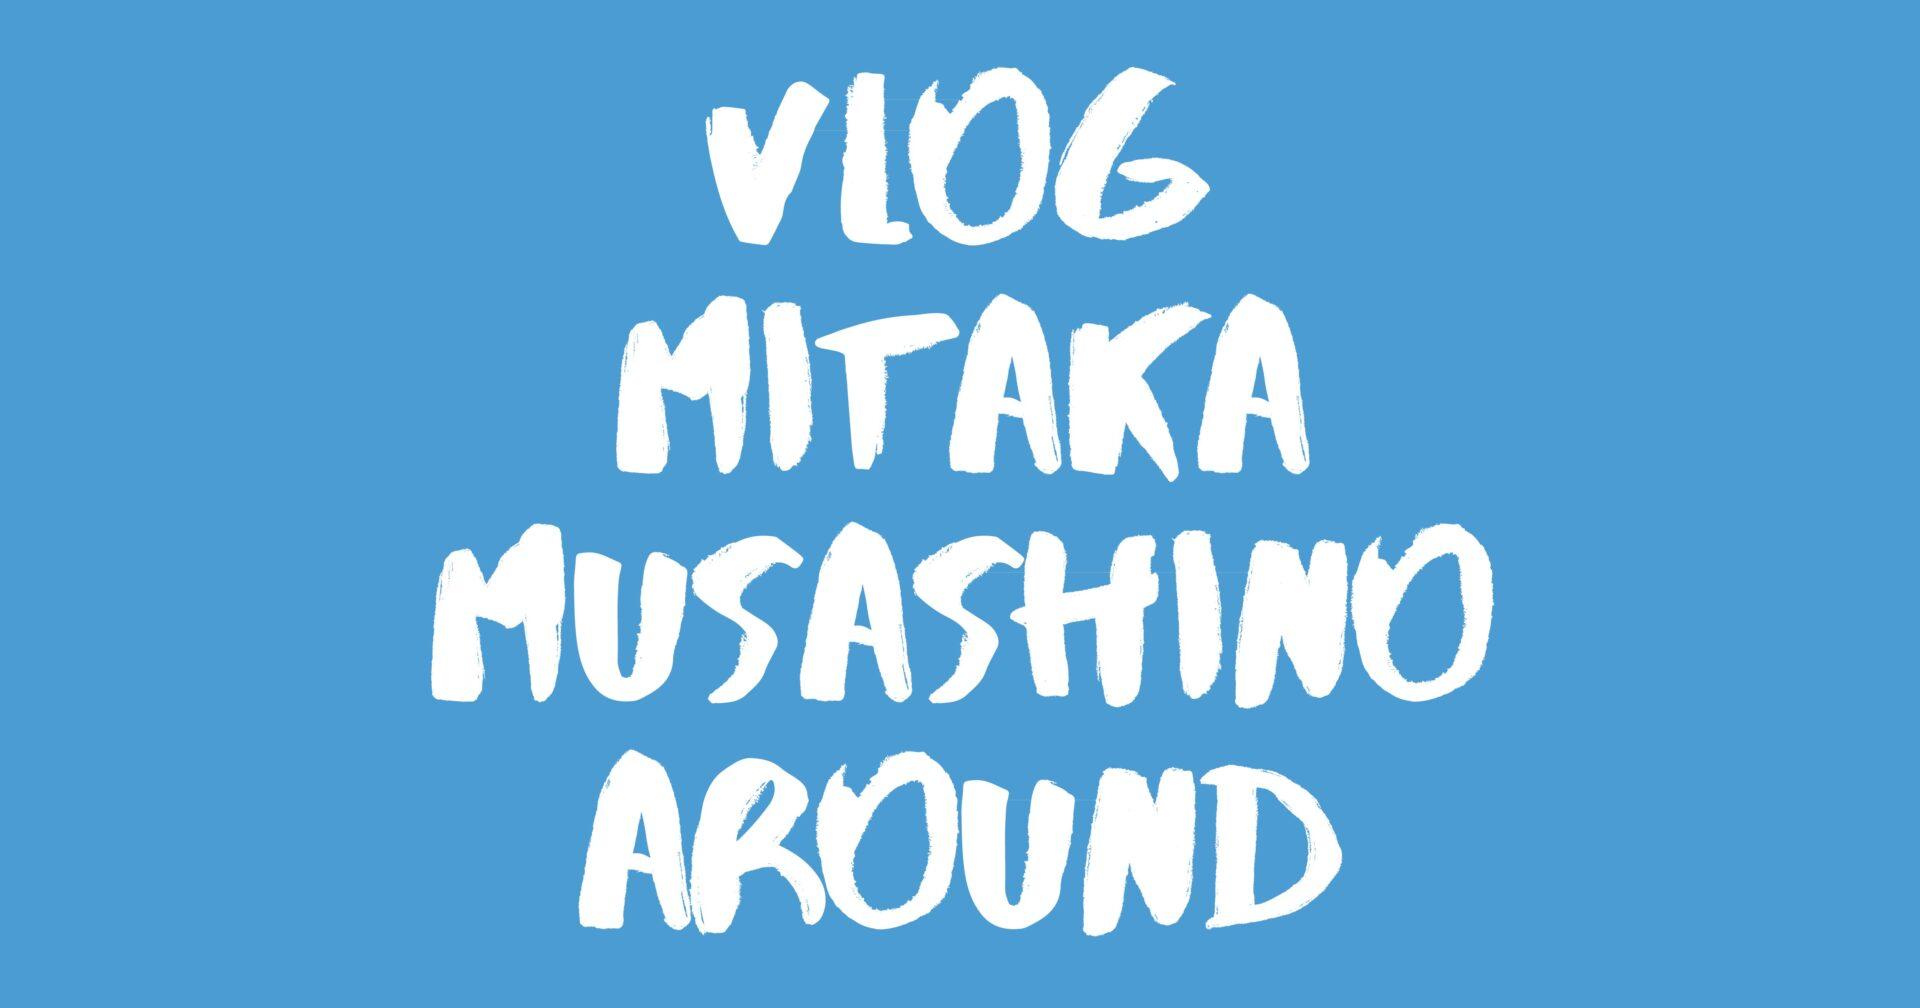 [Vlog] 三鷹&武蔵野周辺エリア / Mitaka, Musashino & Around